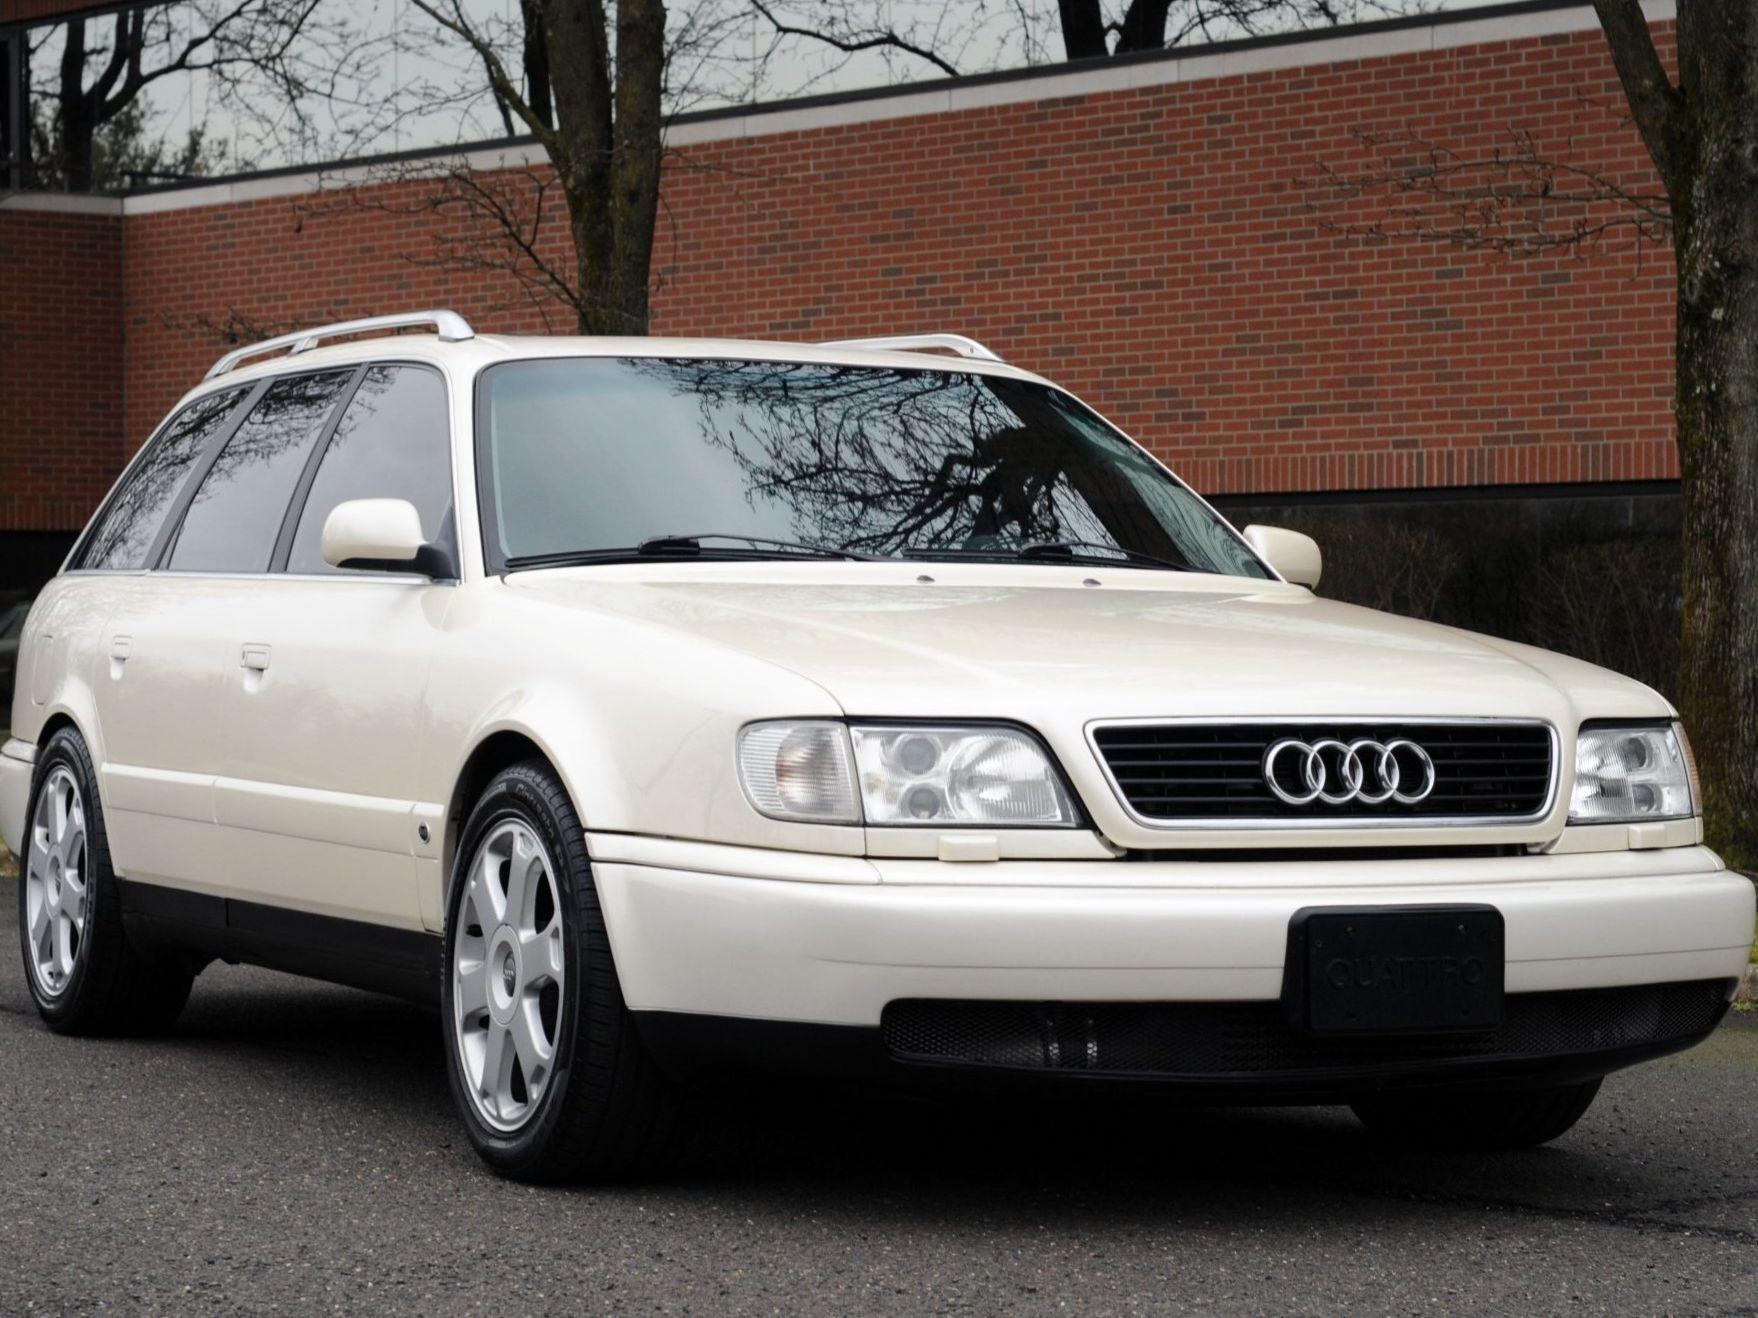 Audi S6 - C4 Market - CLASSIC.COM